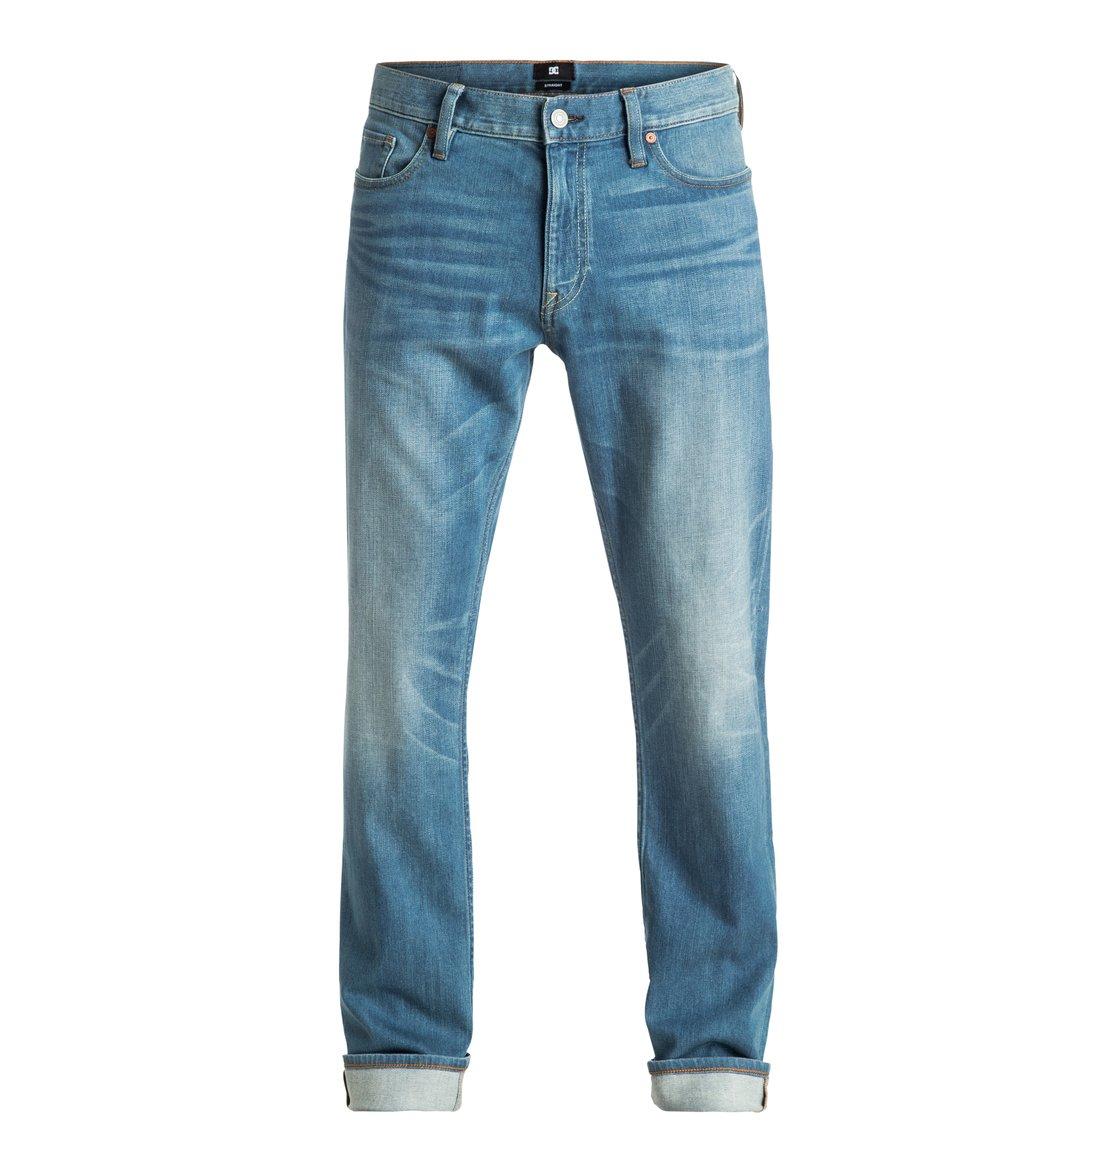 dc shoes Worker Medium Stone - Jeans Vestibilità Straight da Uomo - Blue - DC Shoes